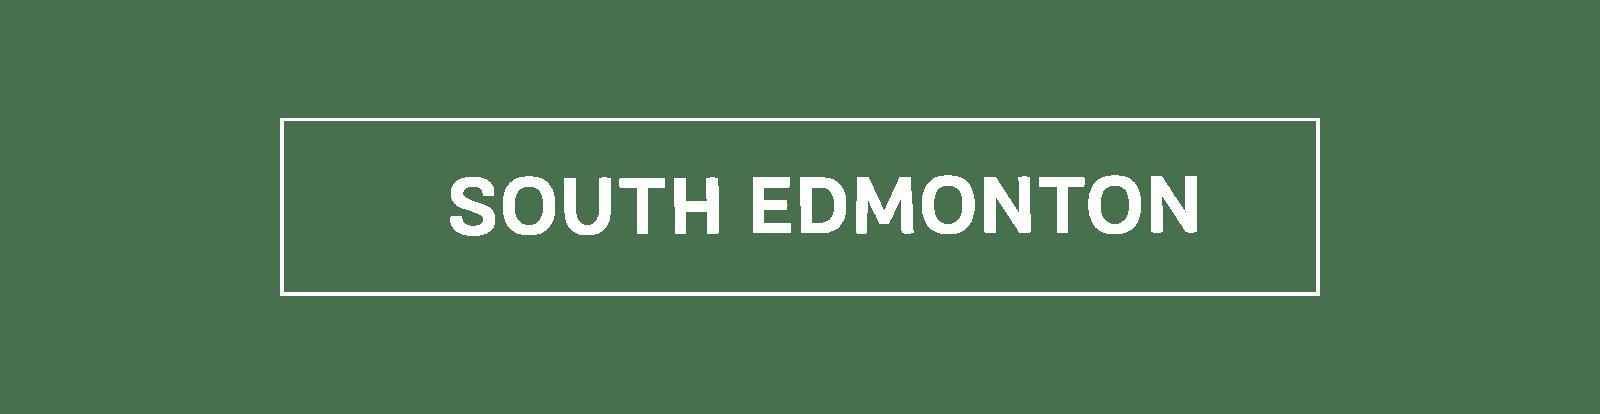 SOUTH EDMONTON